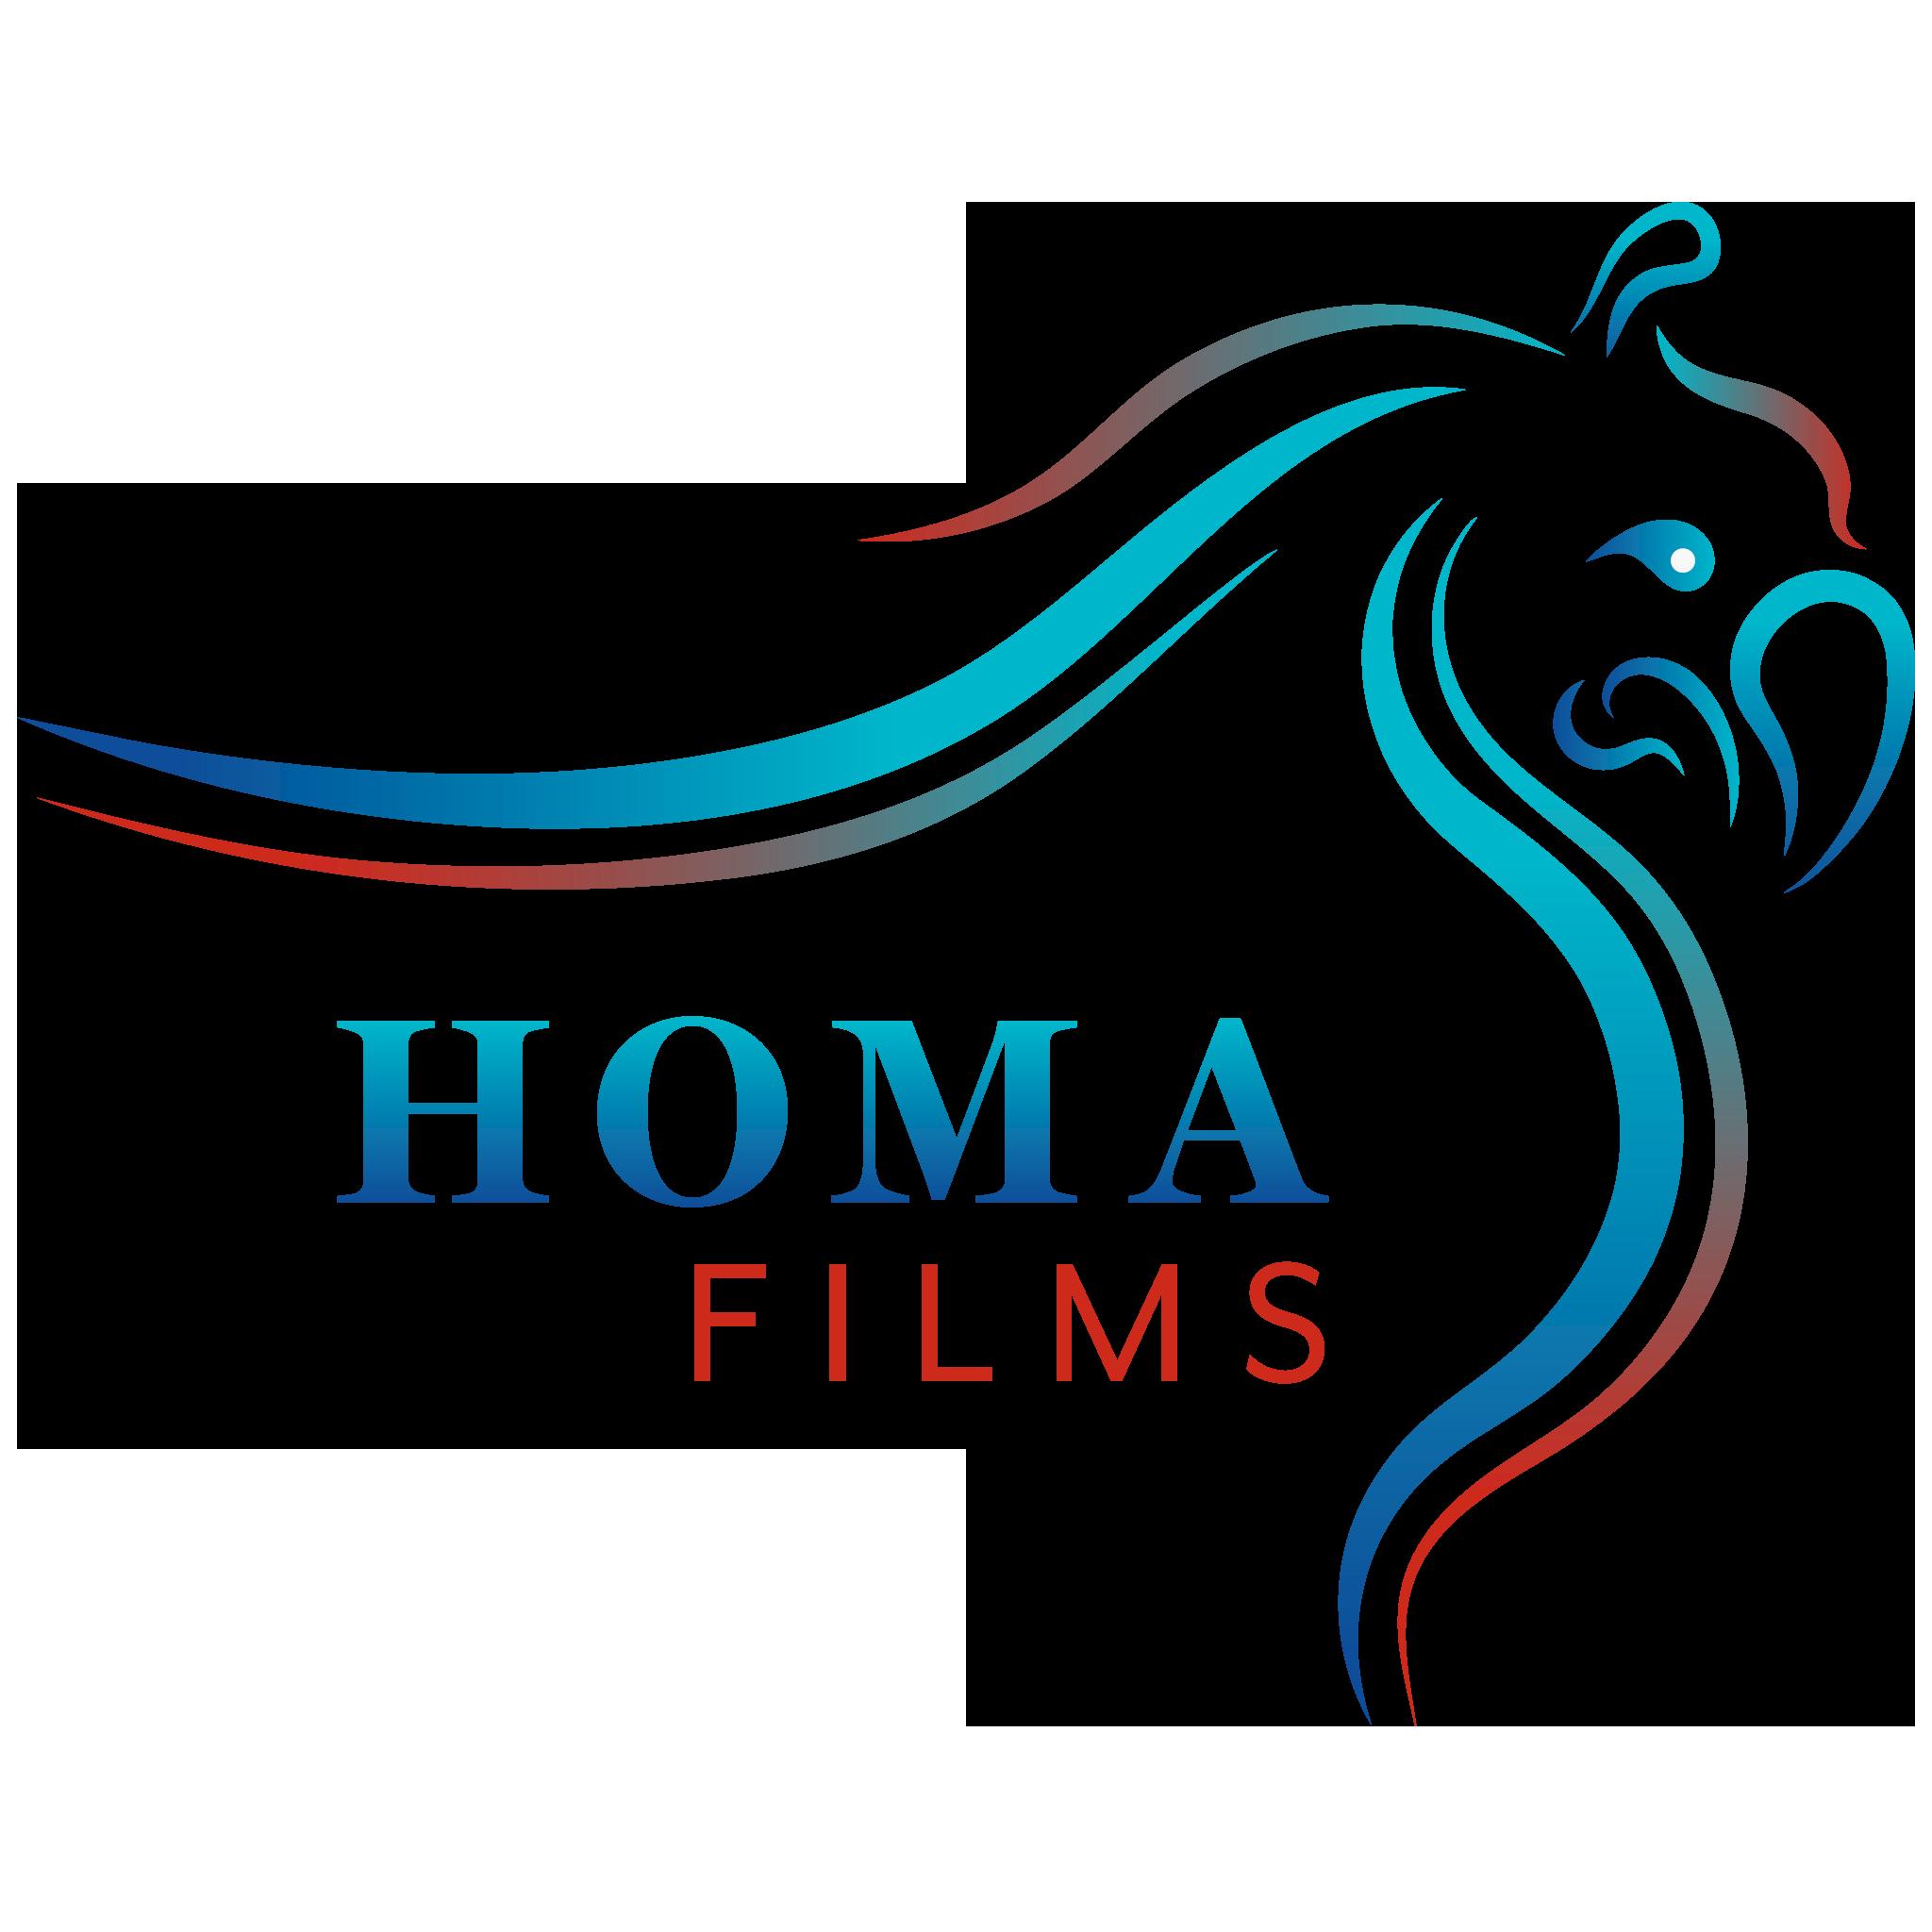 Homa Films Brand Identity